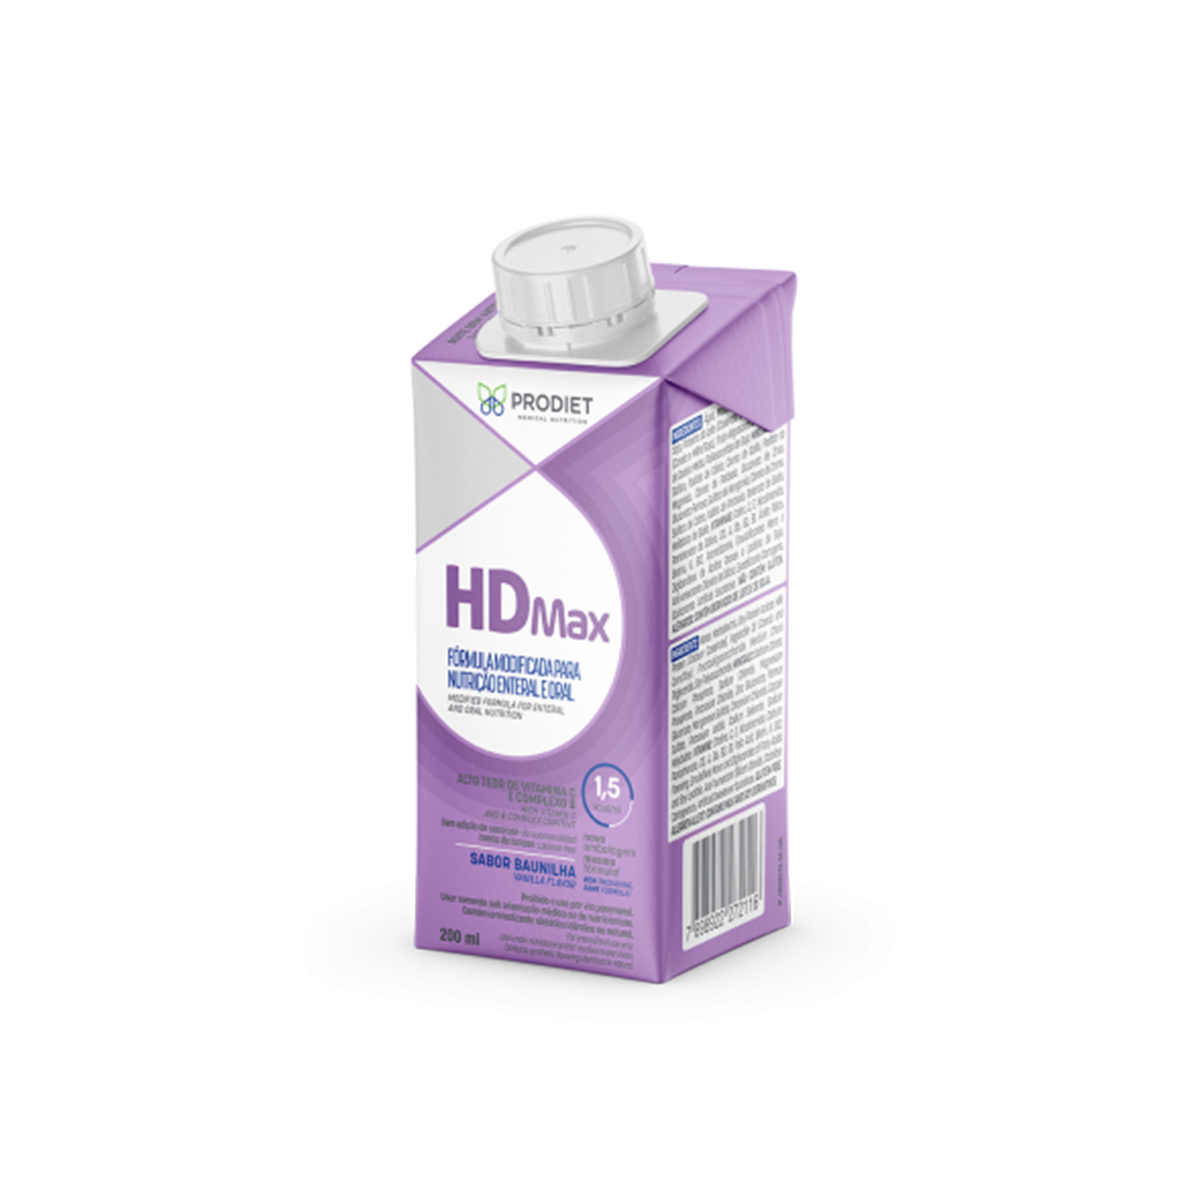 HDMAX 200ML - PRODIET